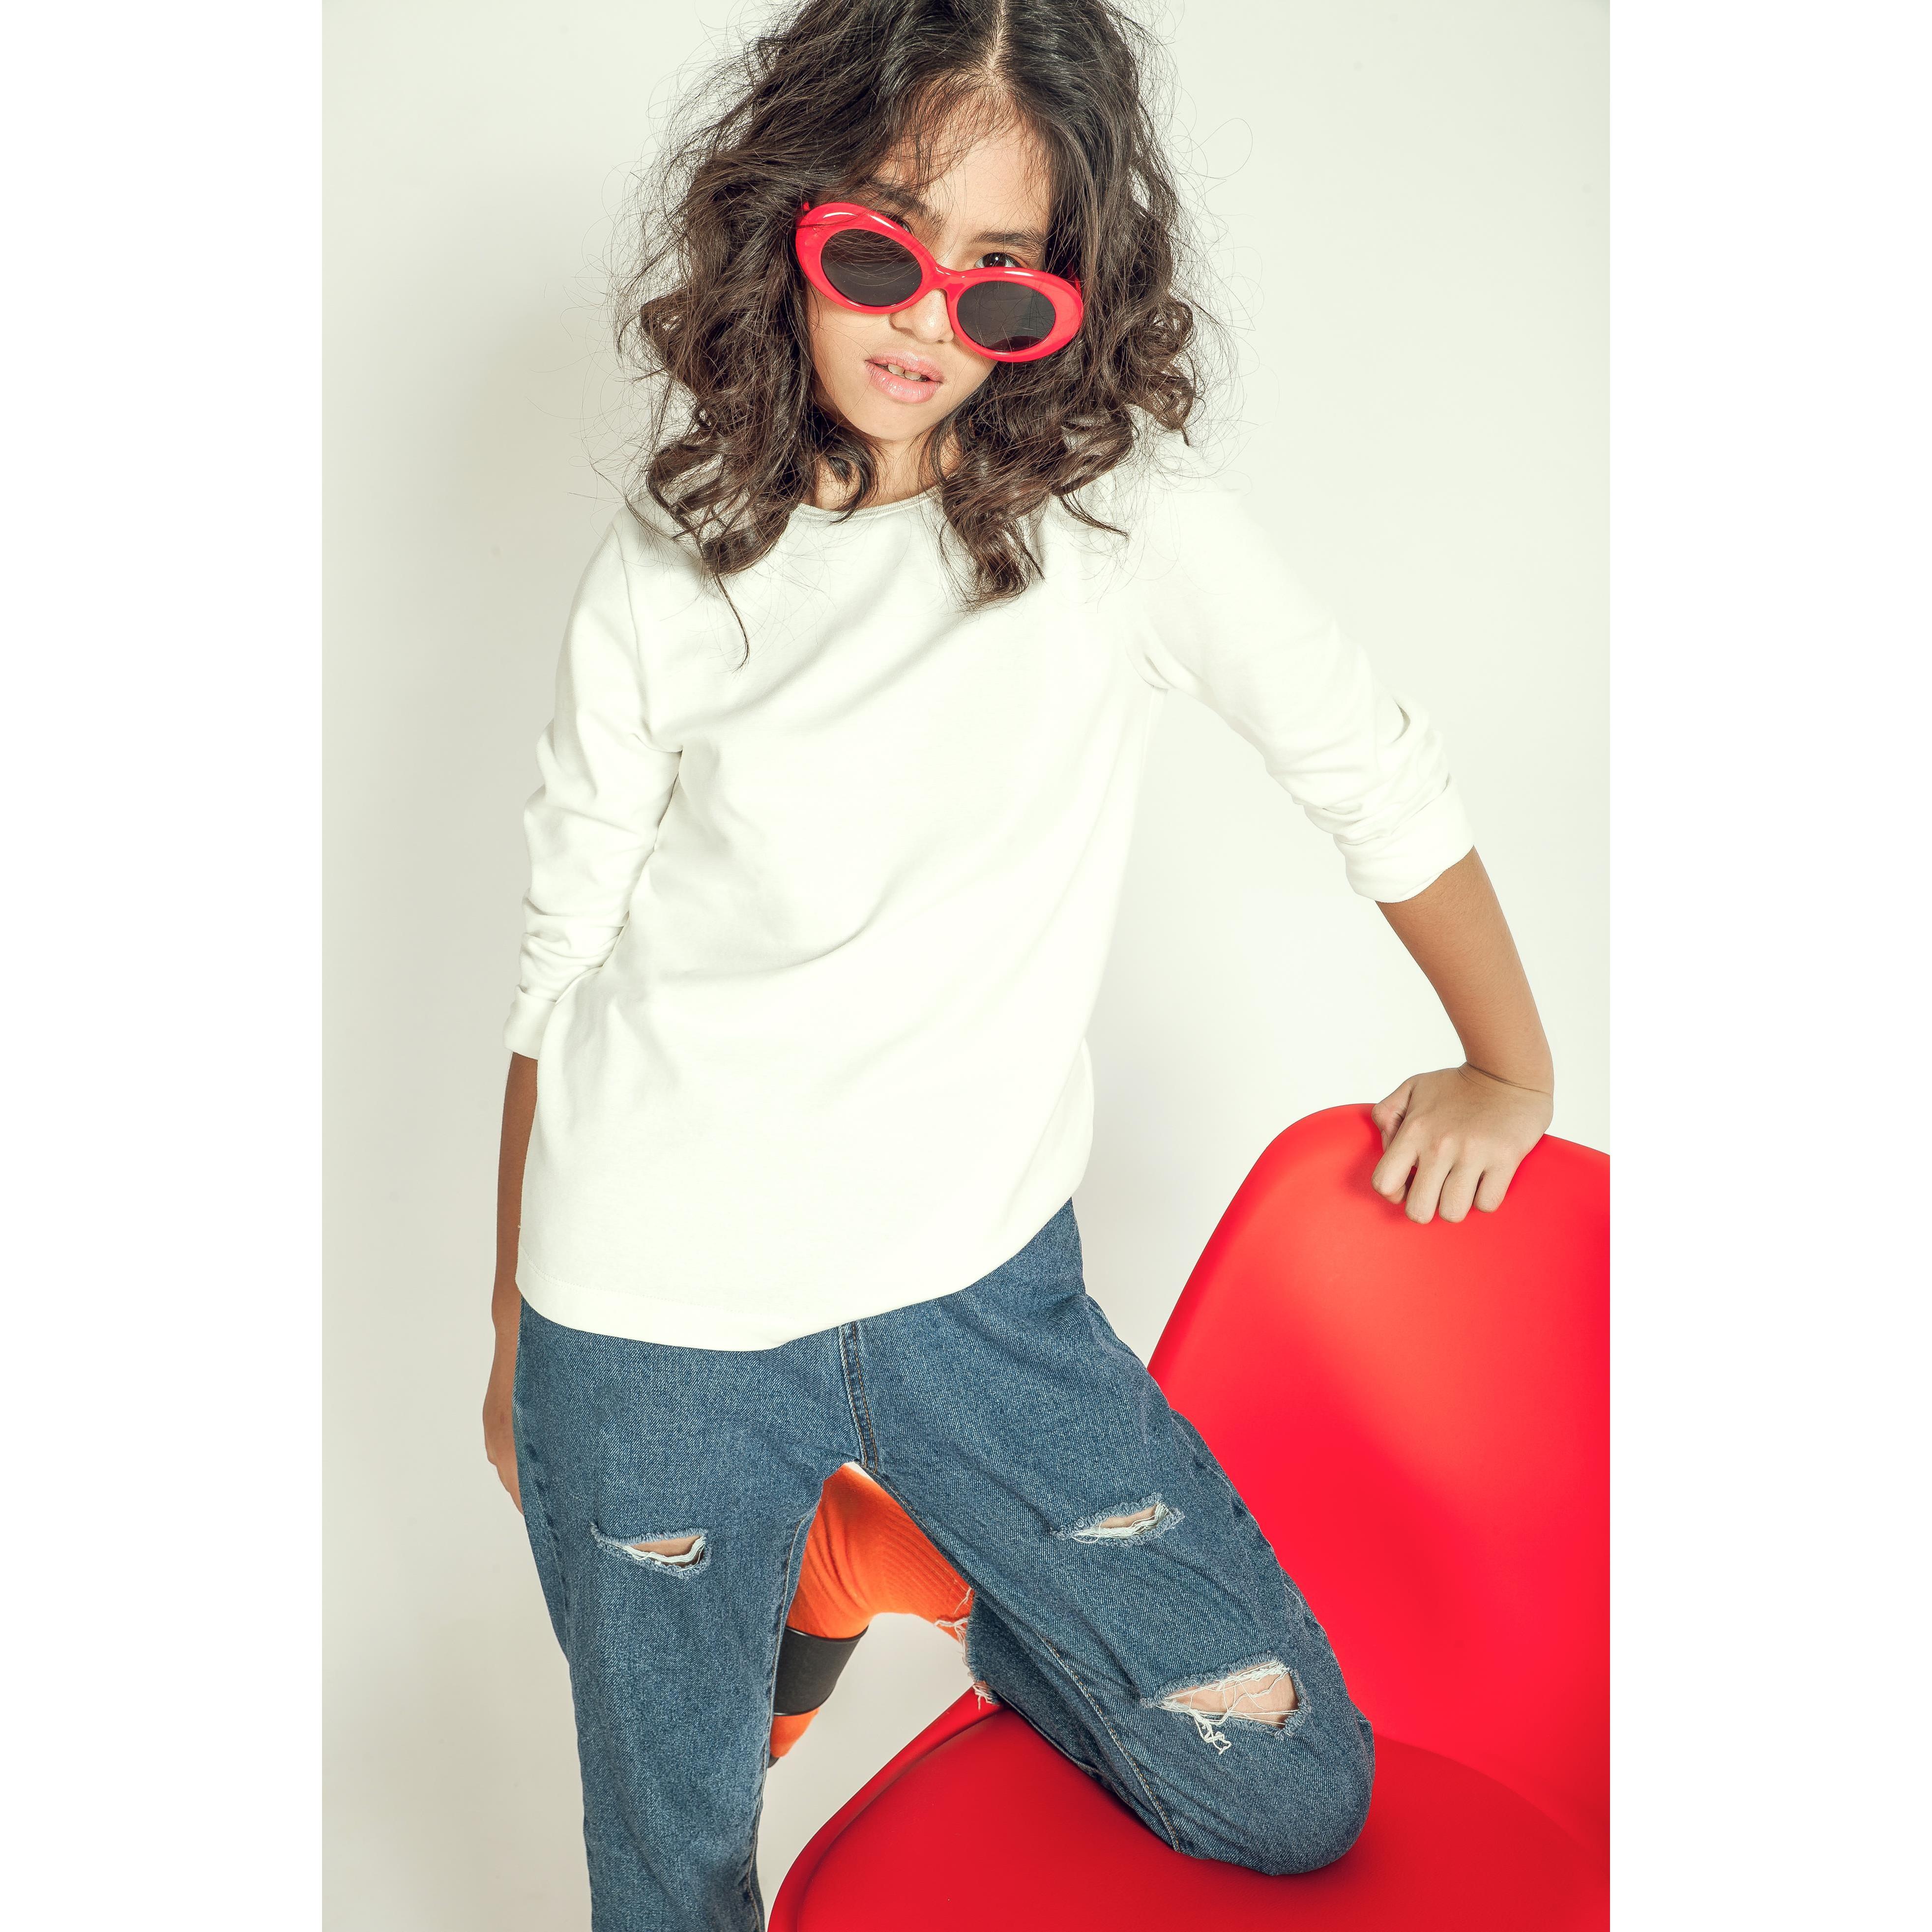 Quần jeans baggy mài rách bé gái (4-13 tuổi) - 16659582 , 5843078262568 , 62_27687370 , 389000 , Quan-jeans-baggy-mai-rach-be-gai-4-13-tuoi-62_27687370 , tiki.vn , Quần jeans baggy mài rách bé gái (4-13 tuổi)